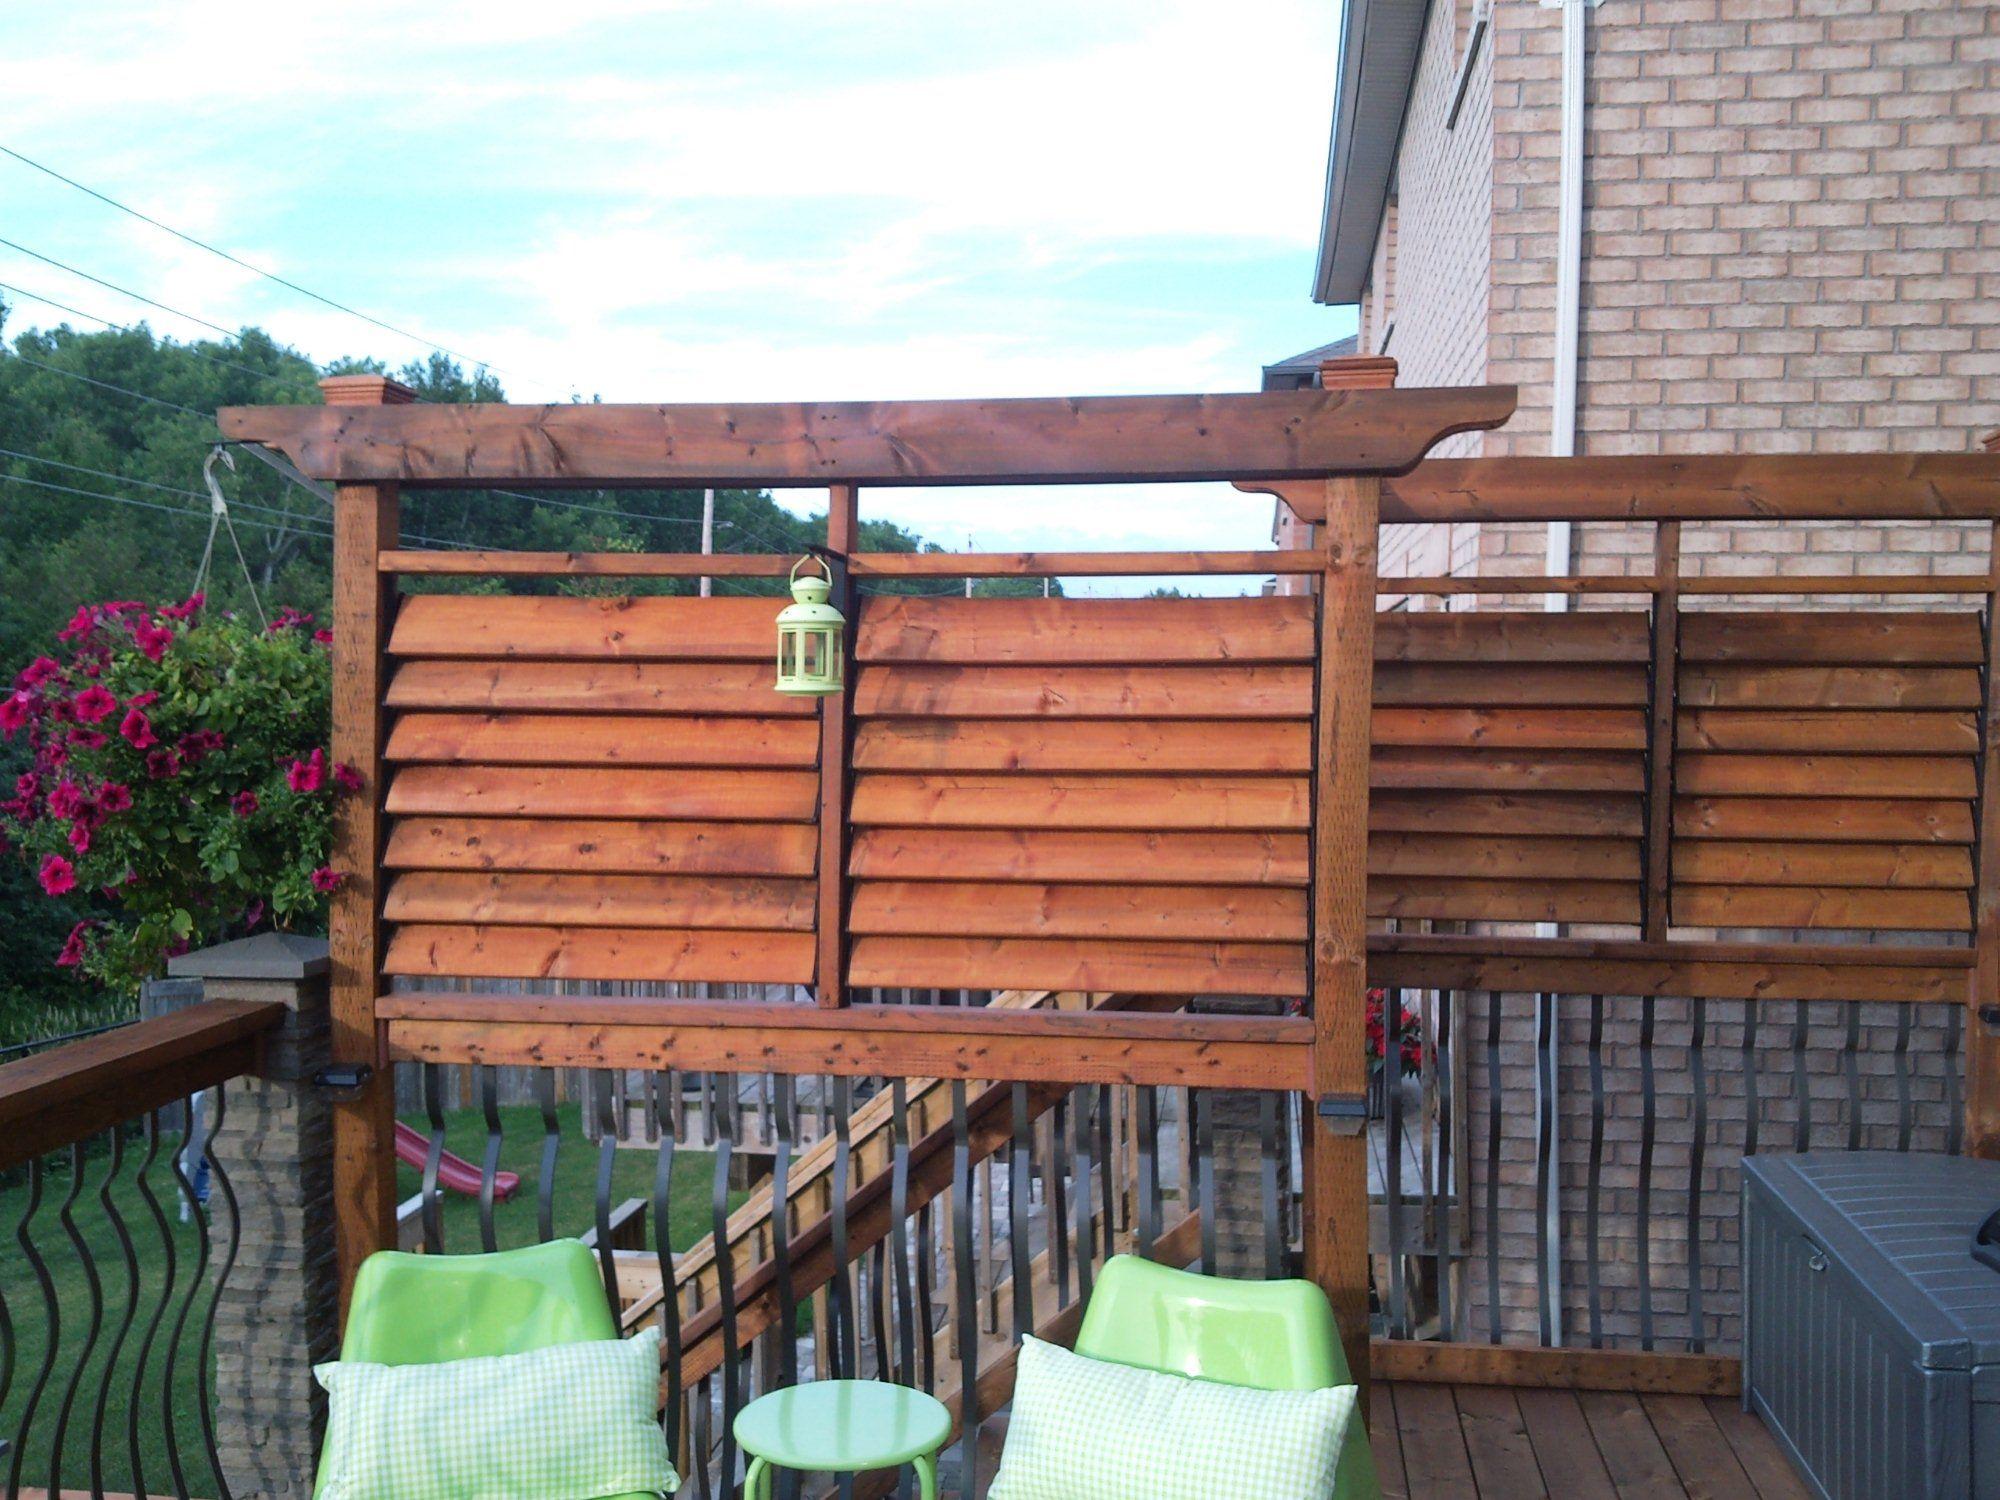 FLEX•fence Creation By Thommoknockers Custom Decks. Louver